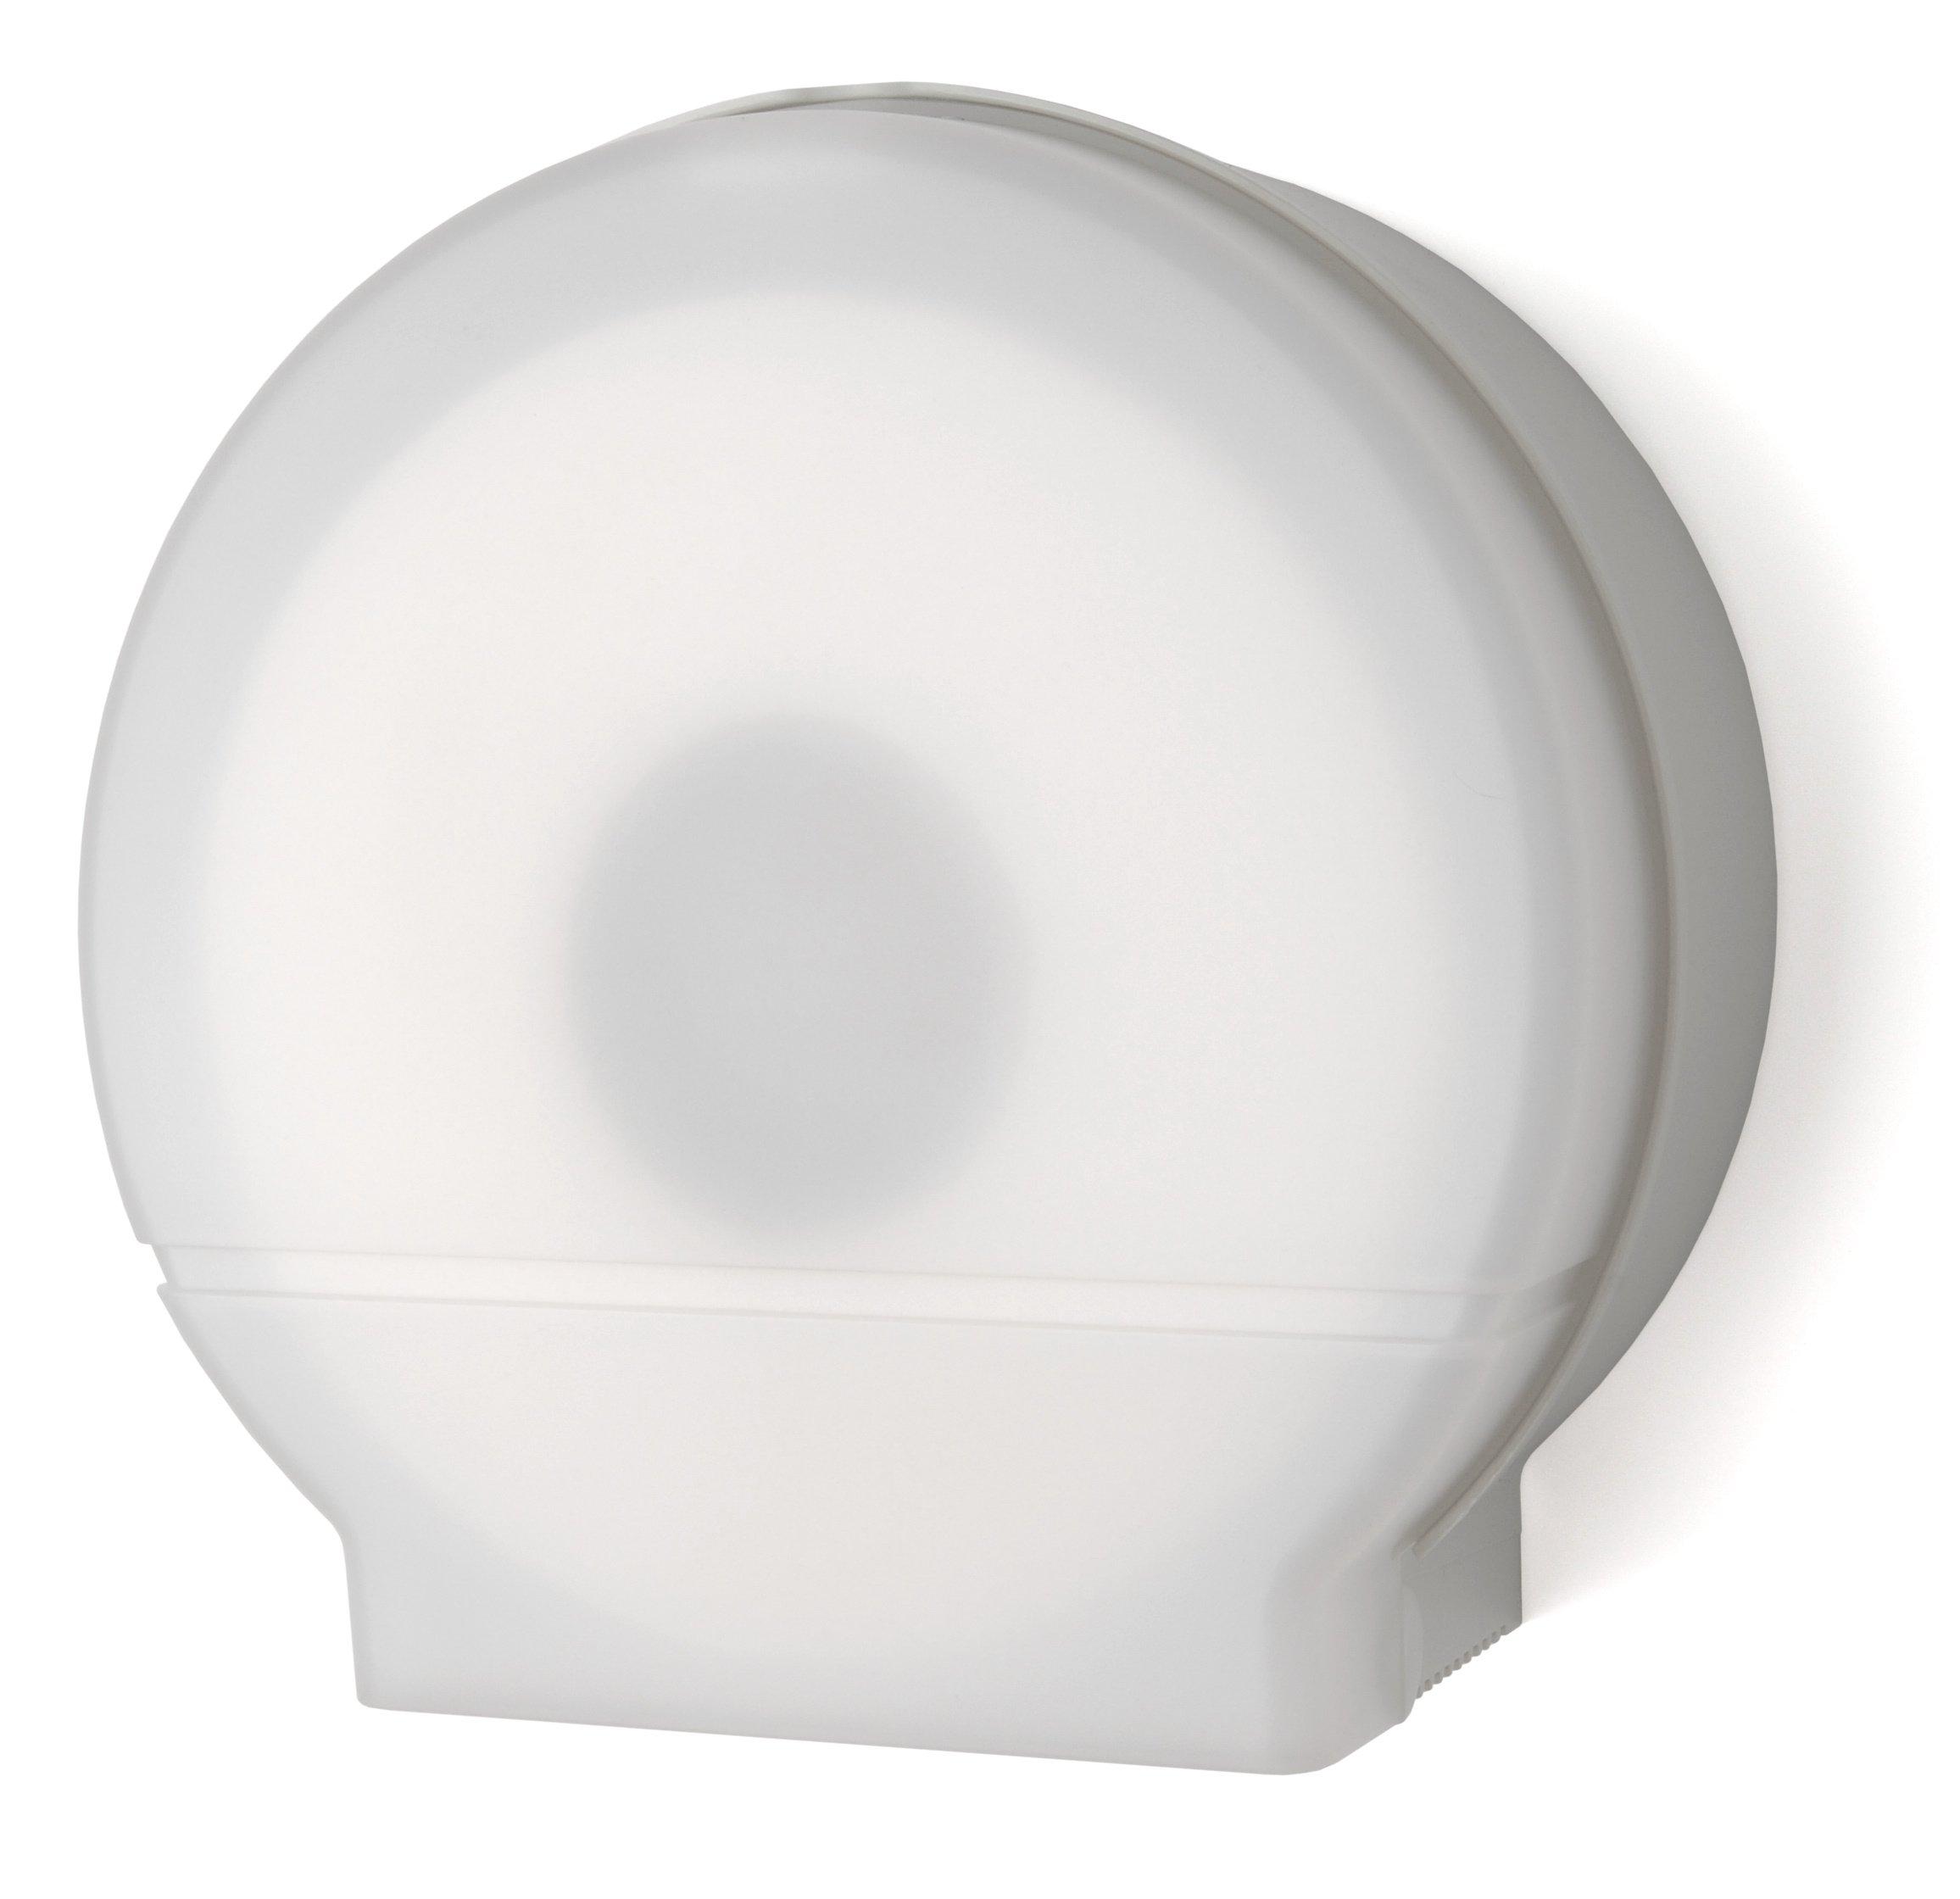 Palmer Fixture RD0026-03F Single Roll Jumbo Tissue Dispenser with Core Adaptor, White Translucent